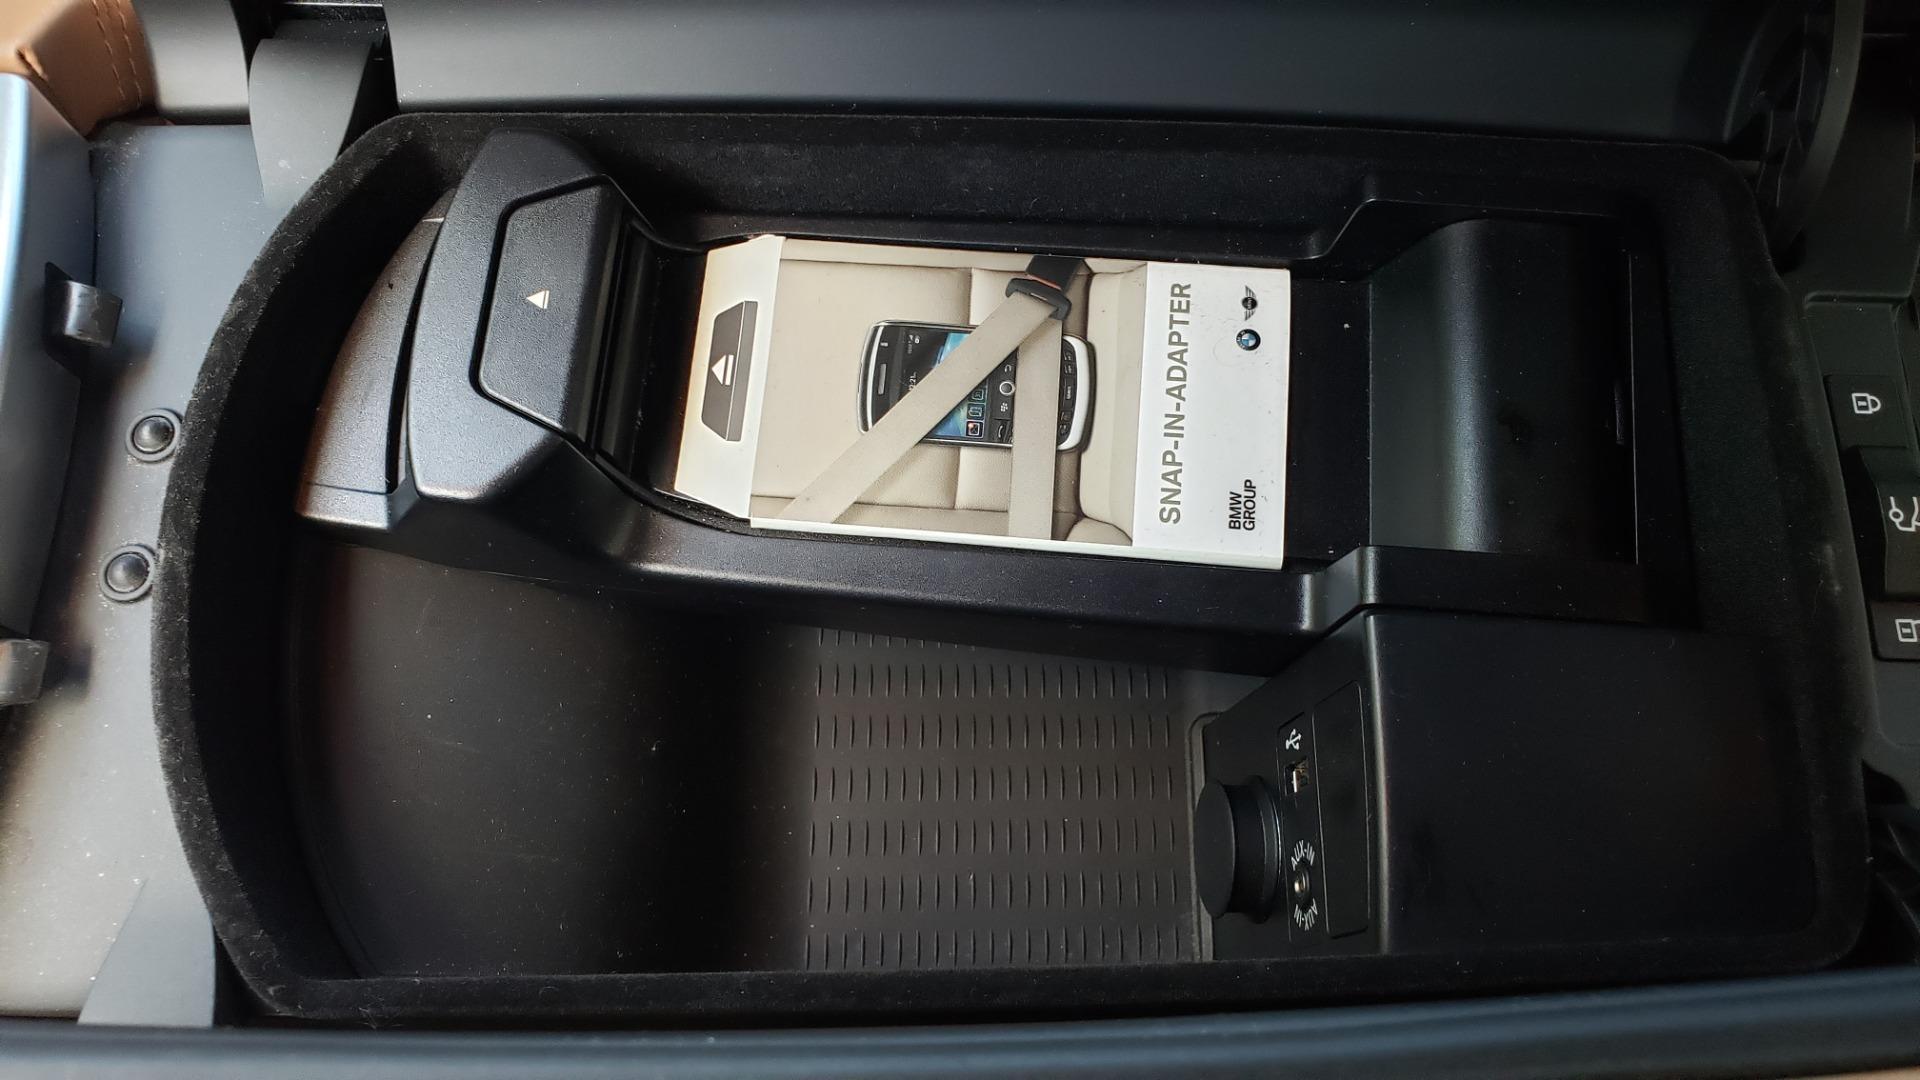 Used 2014 BMW 7 SERIES 750LI M-SPORT / EXEC PKG / DRVR ASST / LIGHTING / NAV / SUNROOF for sale Sold at Formula Imports in Charlotte NC 28227 53